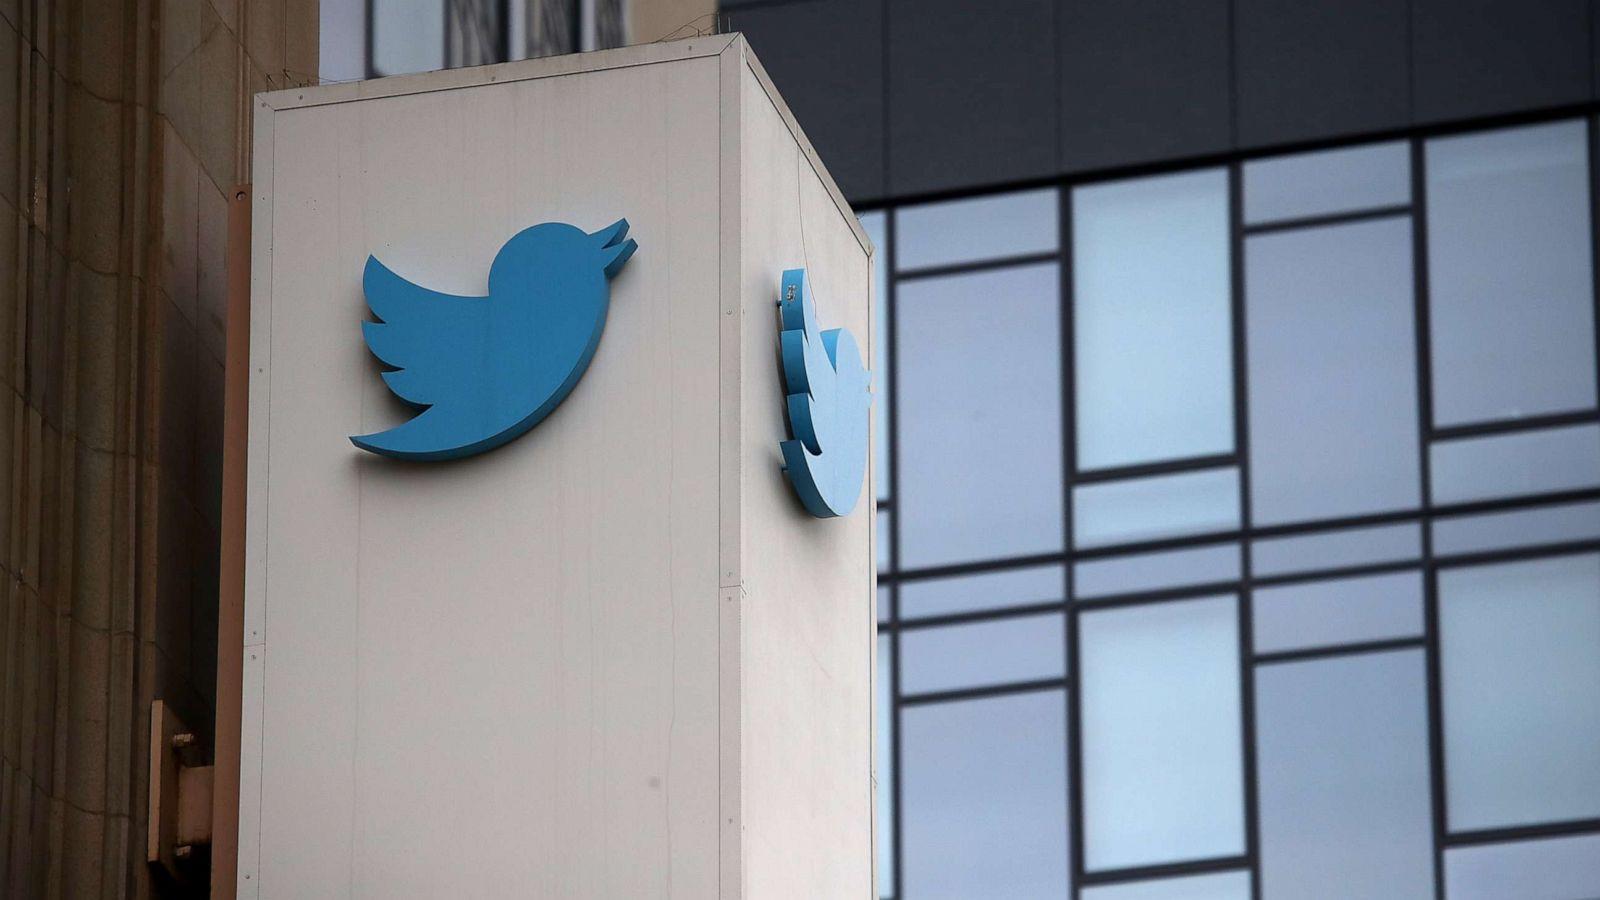 We Know Nigerians are Still Tweeting, Says FG